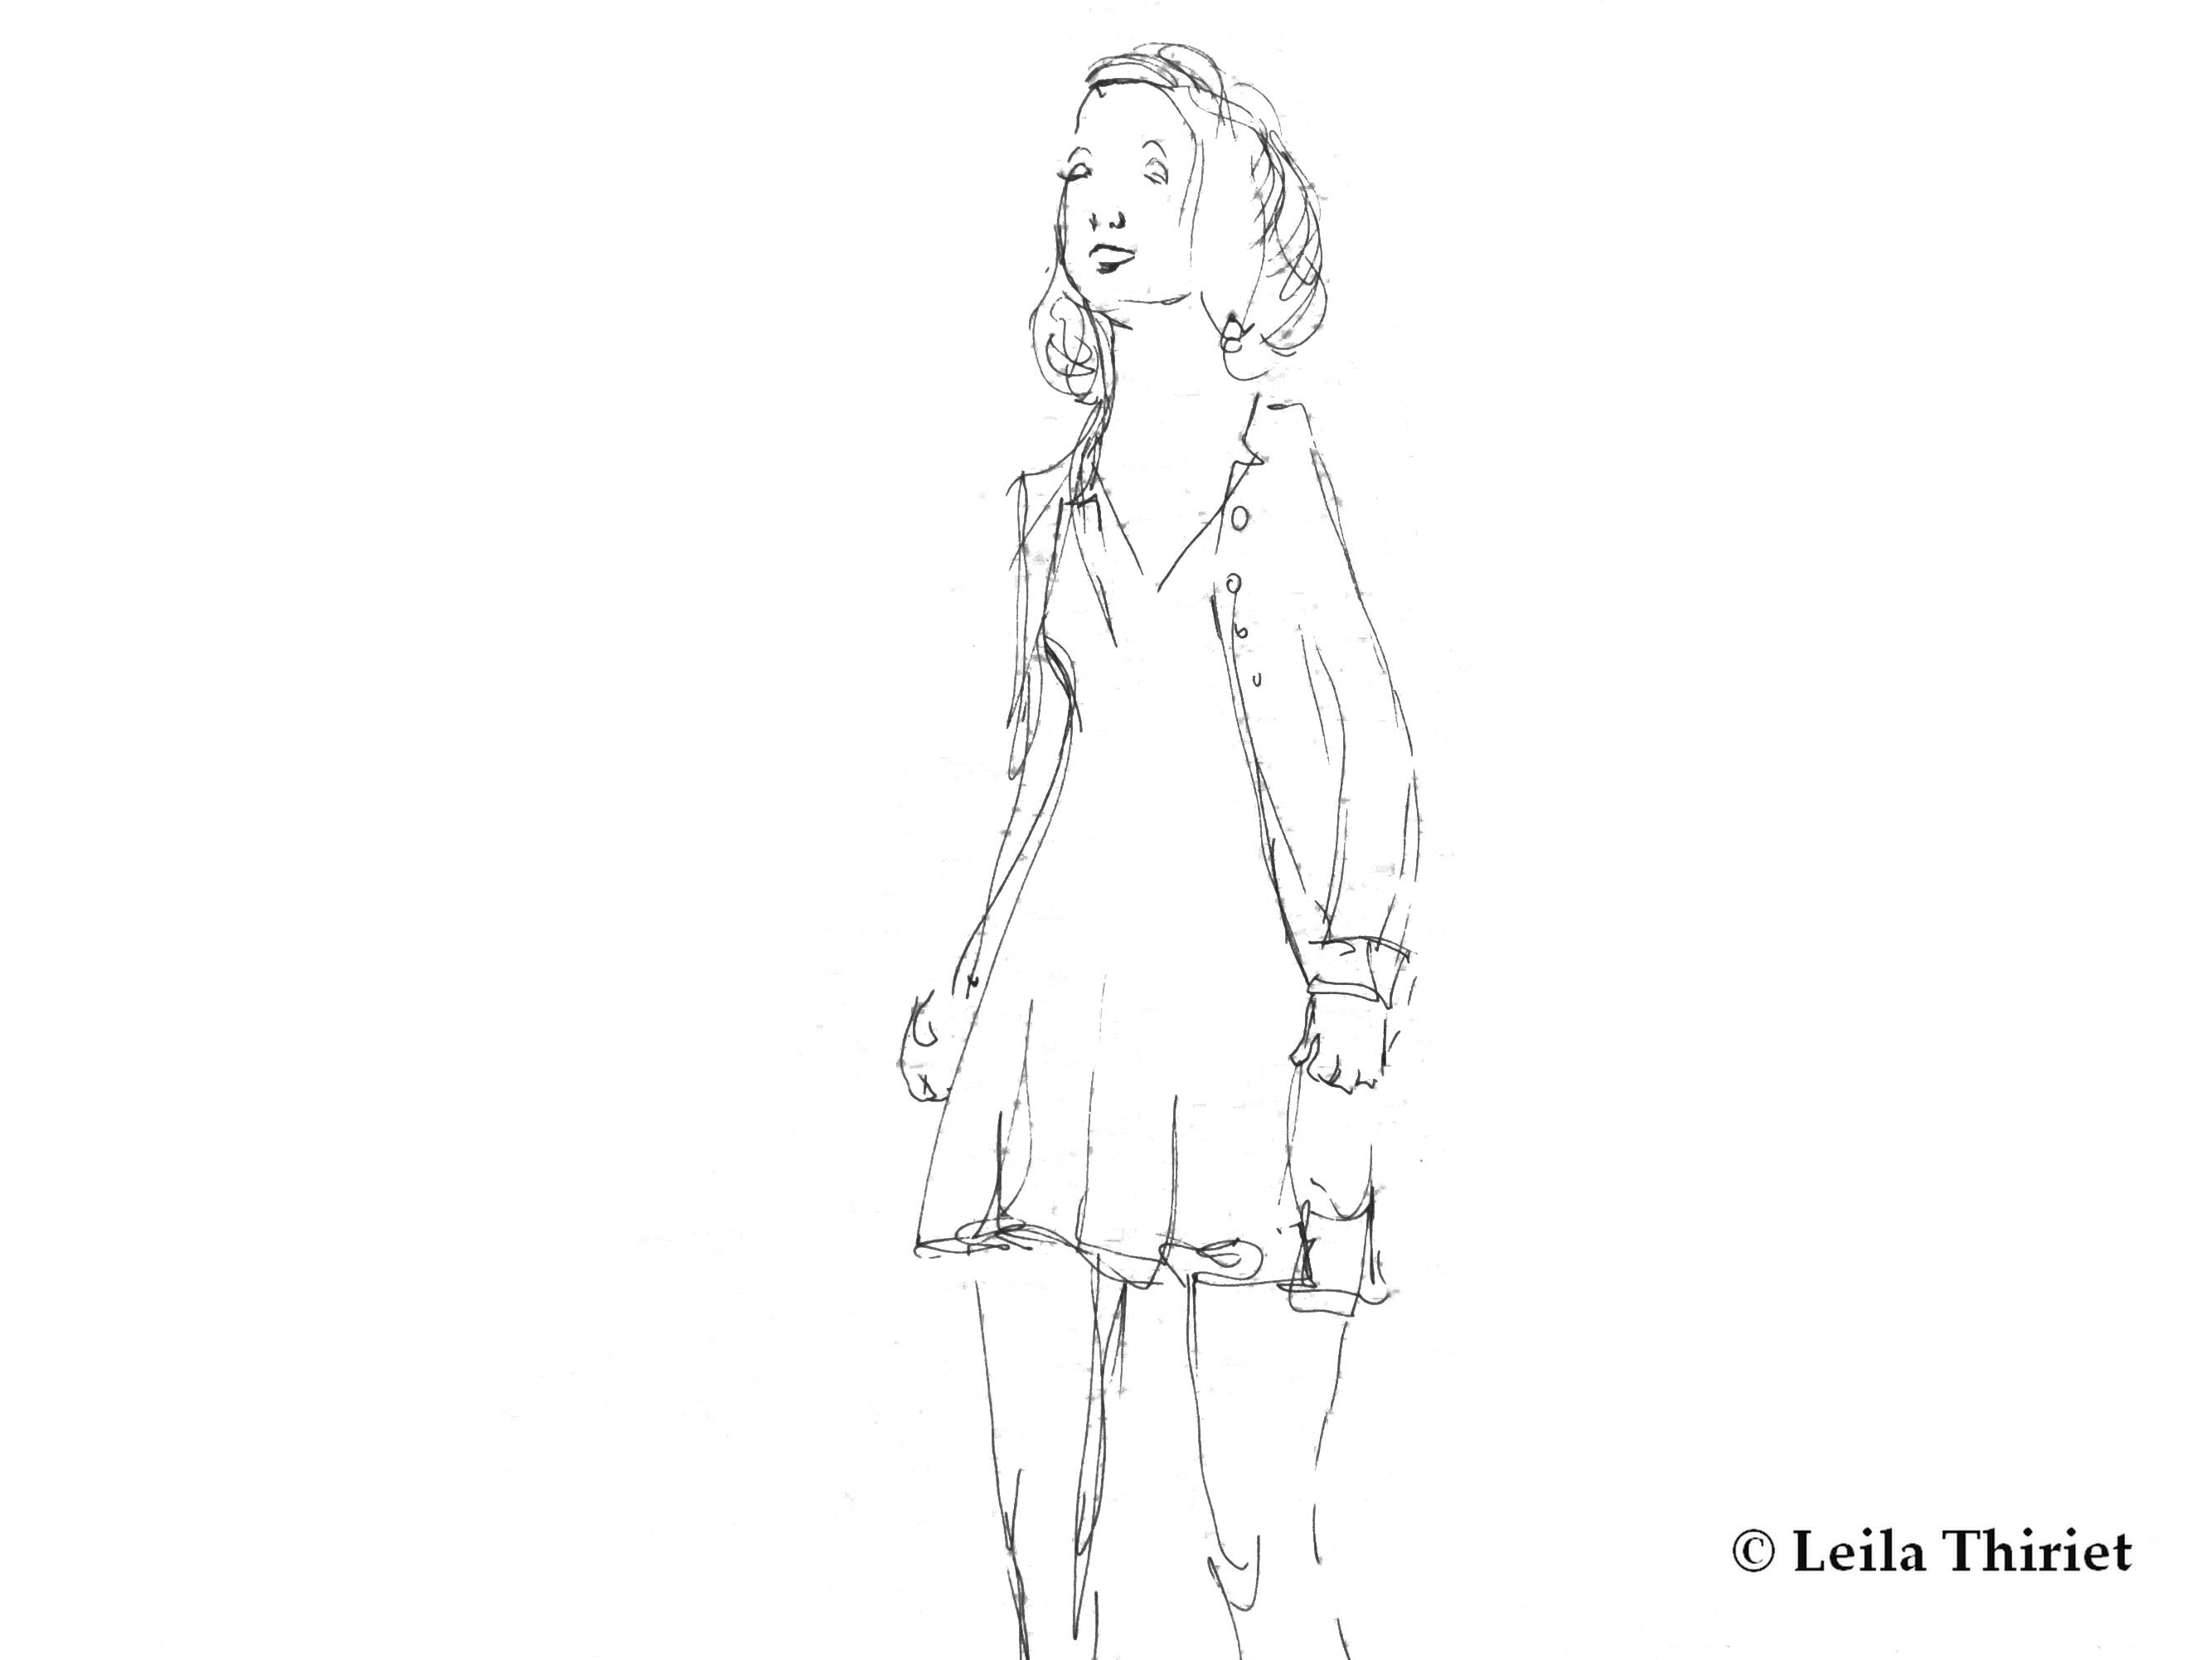 09'-©Leïla Thiriet